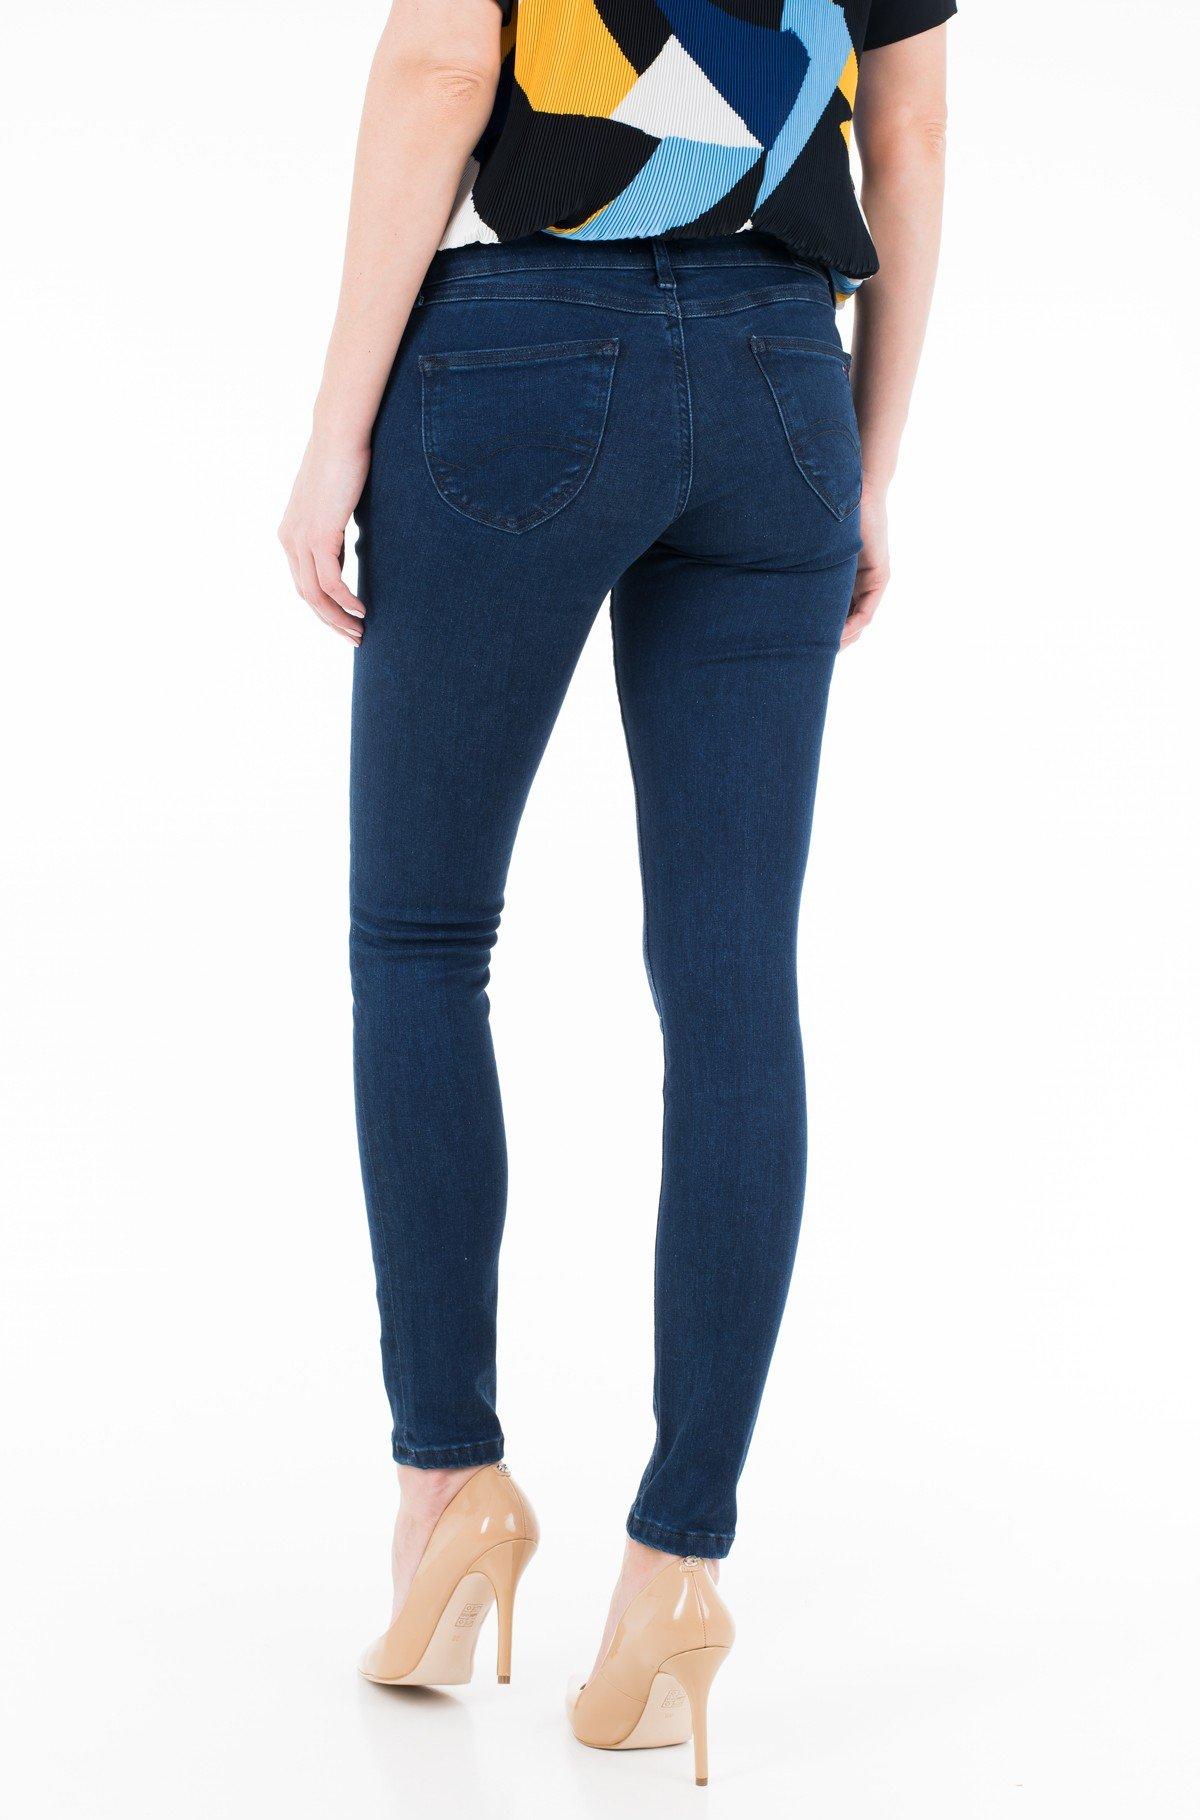 Jeans LOW RISE SKINNY SOPHIE PLSHDK-full-2